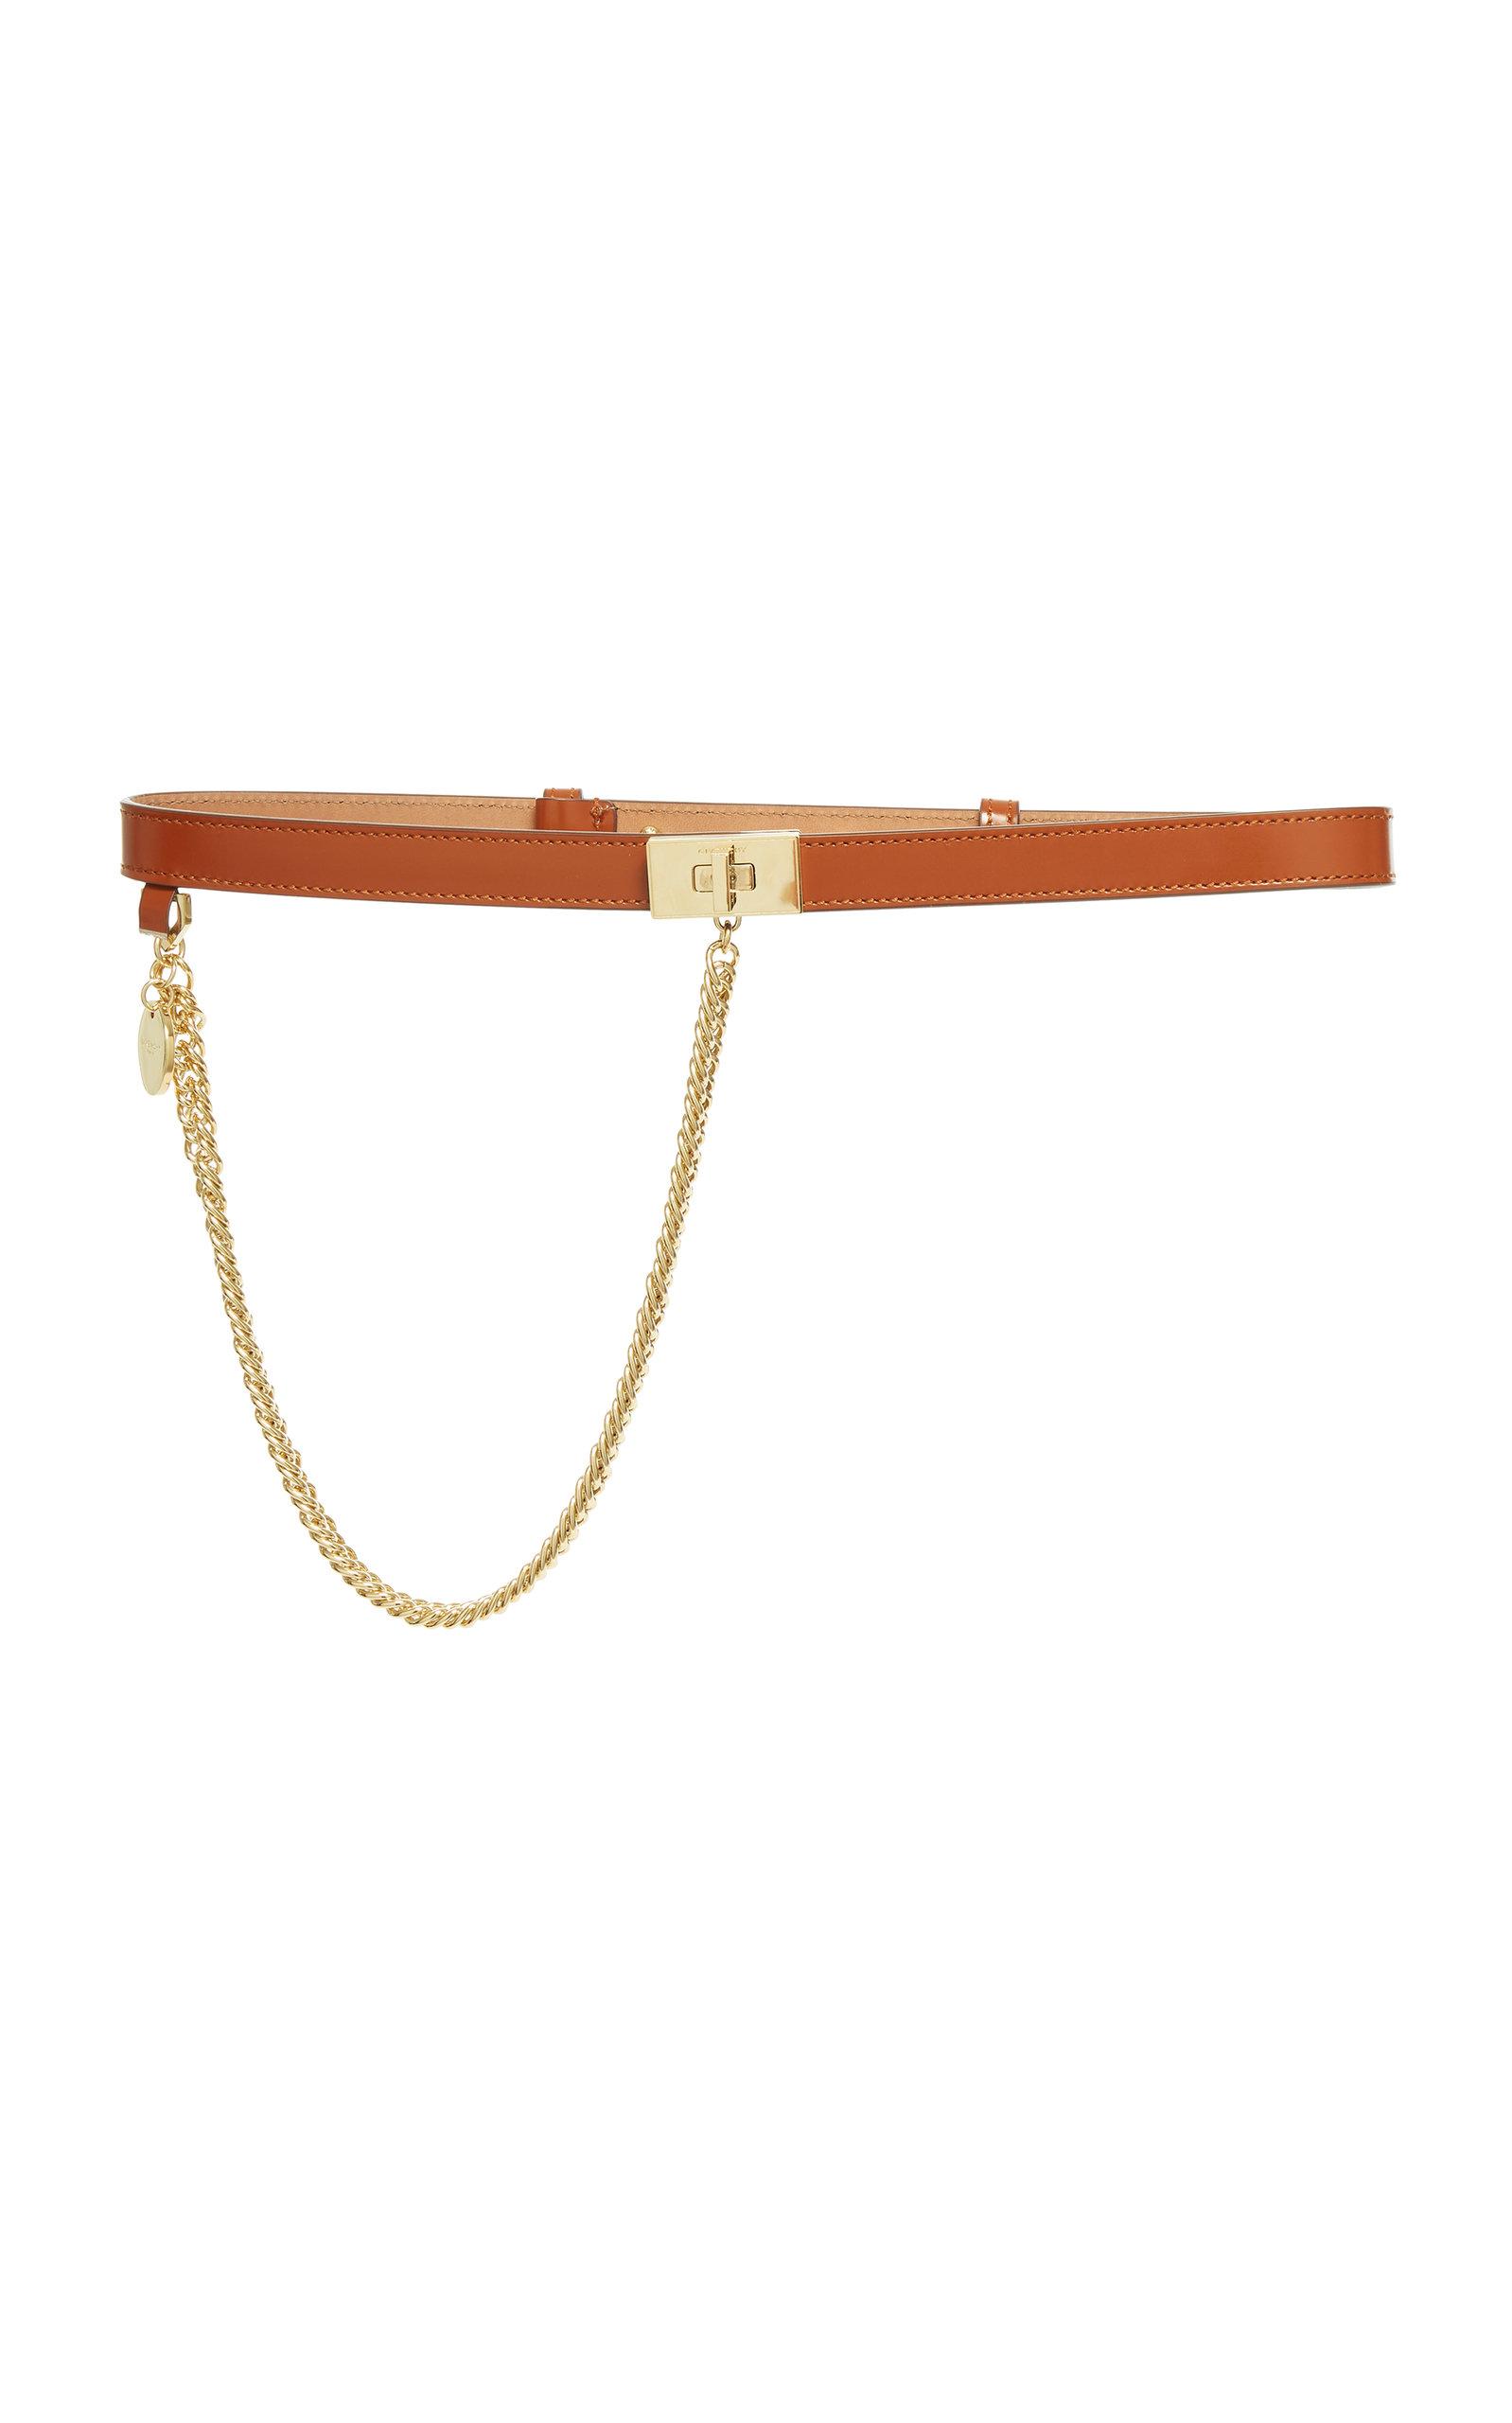 Givenchy Belts CHAIN-EMBELLISHED LEATHER BELT